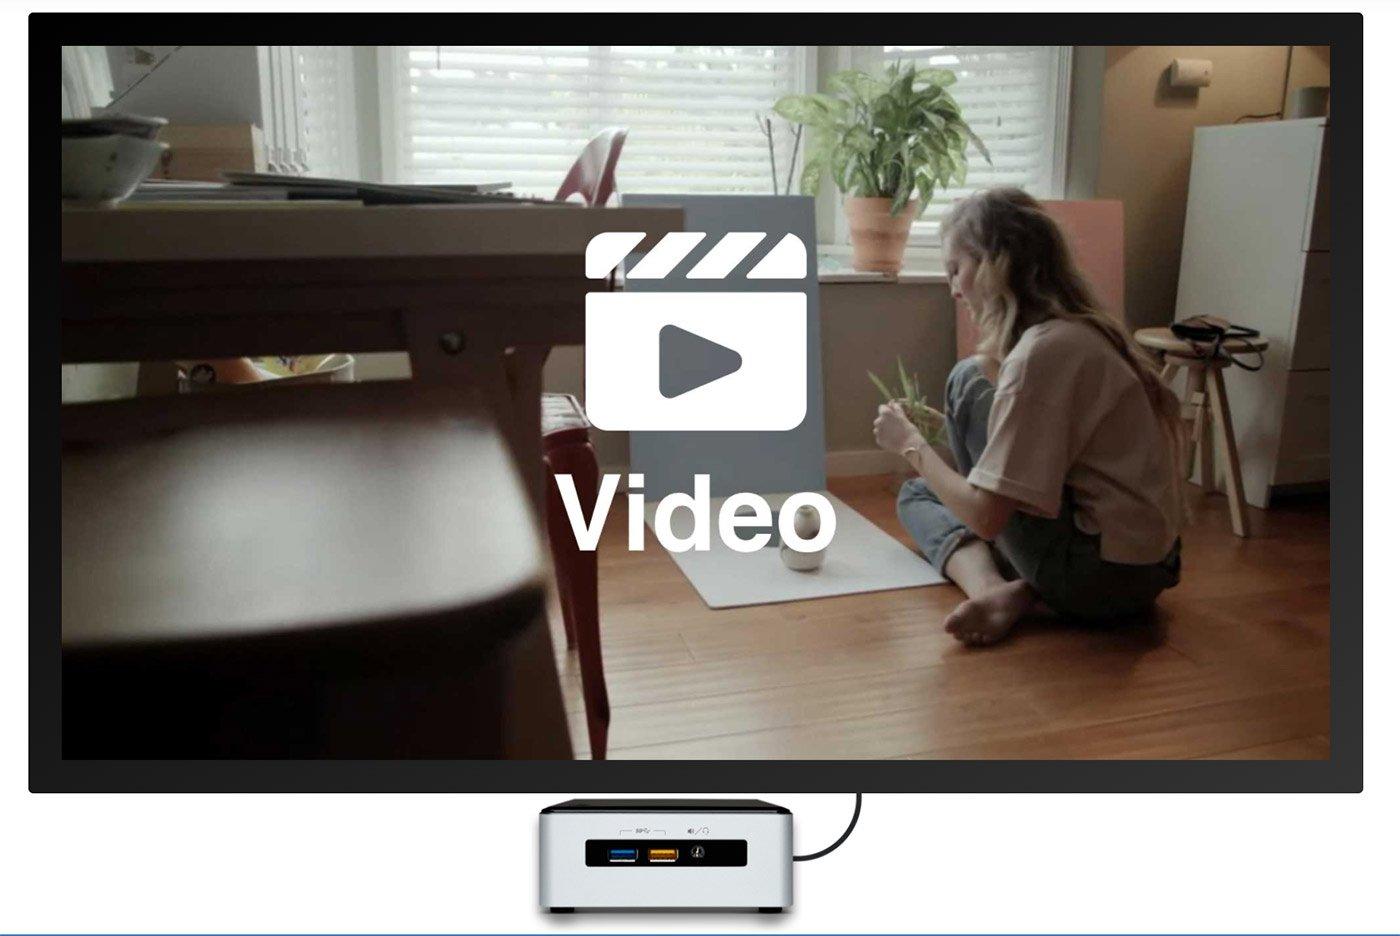 Full Screen Video Digital Signage Template